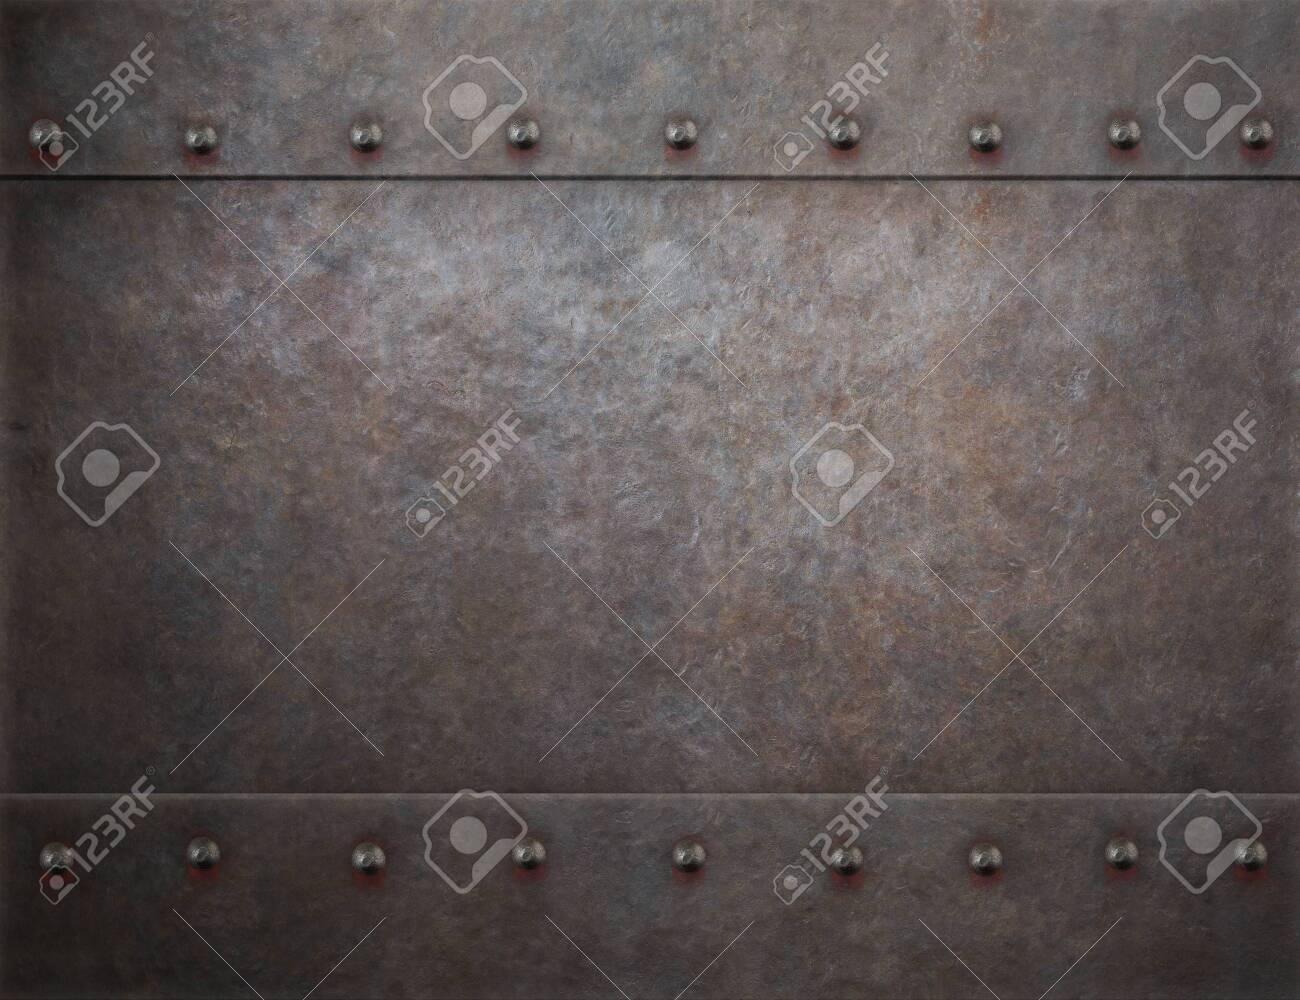 rustic rivets metal background 3d illustration - 131531037